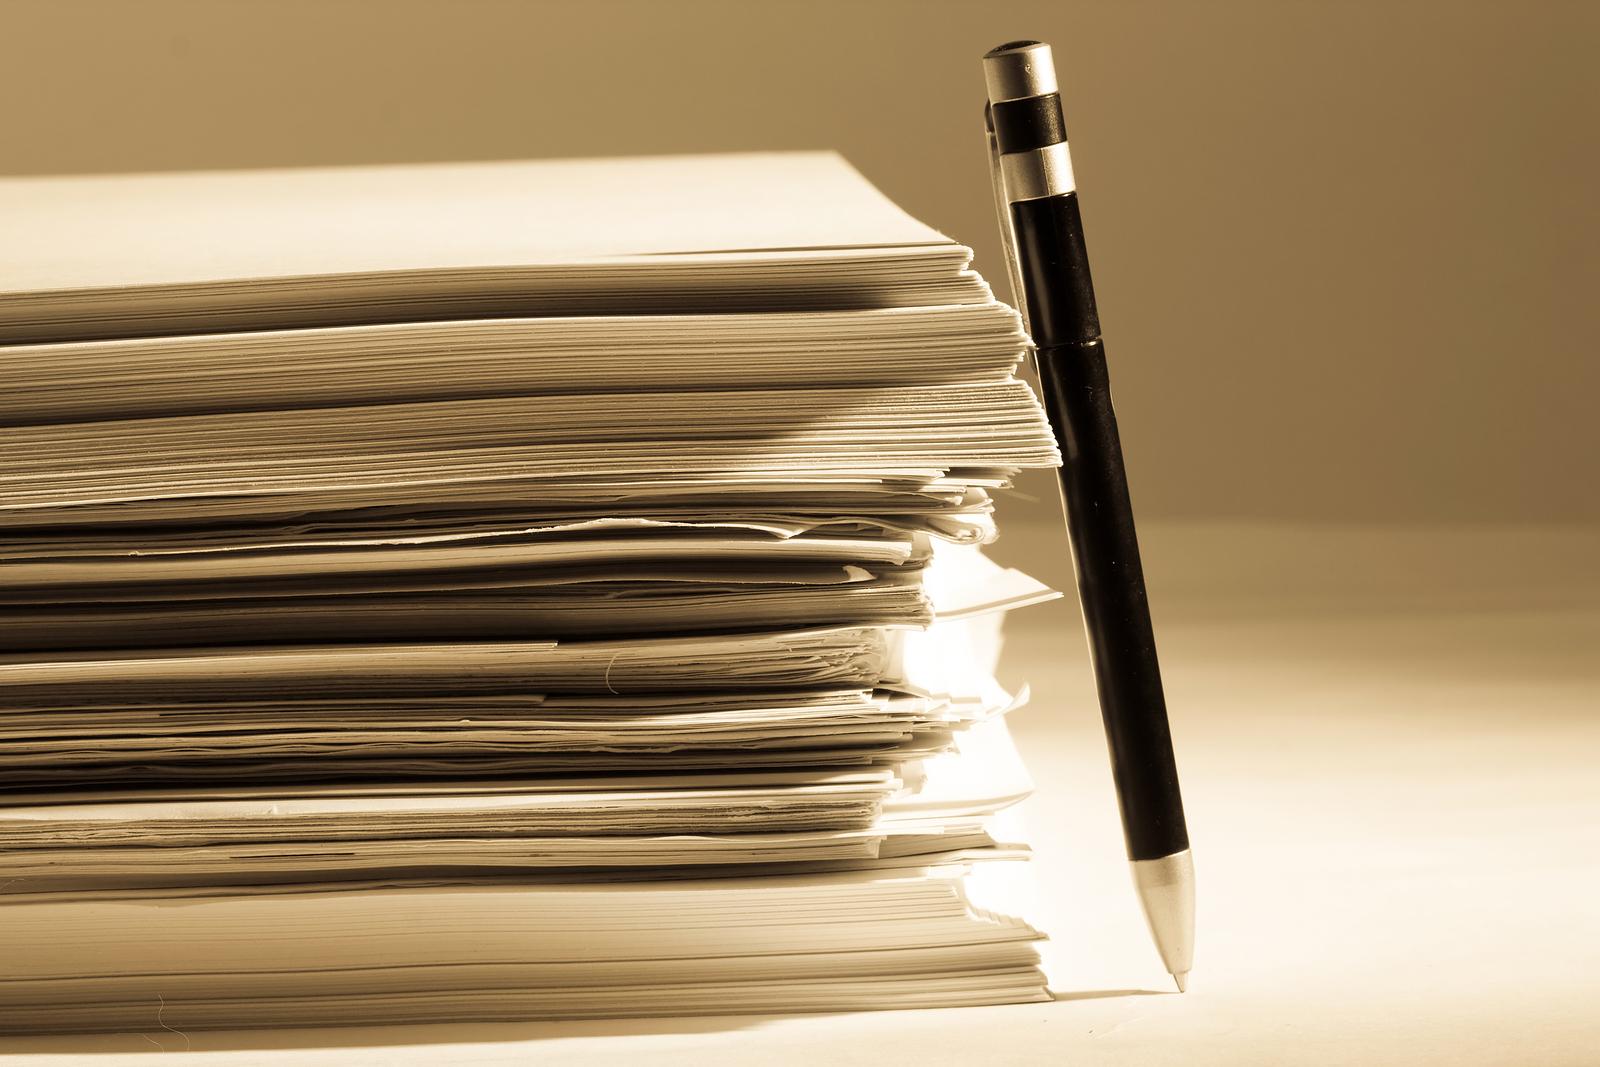 bigstock-a-pen-near-stack-of-paper-12931193.jpg